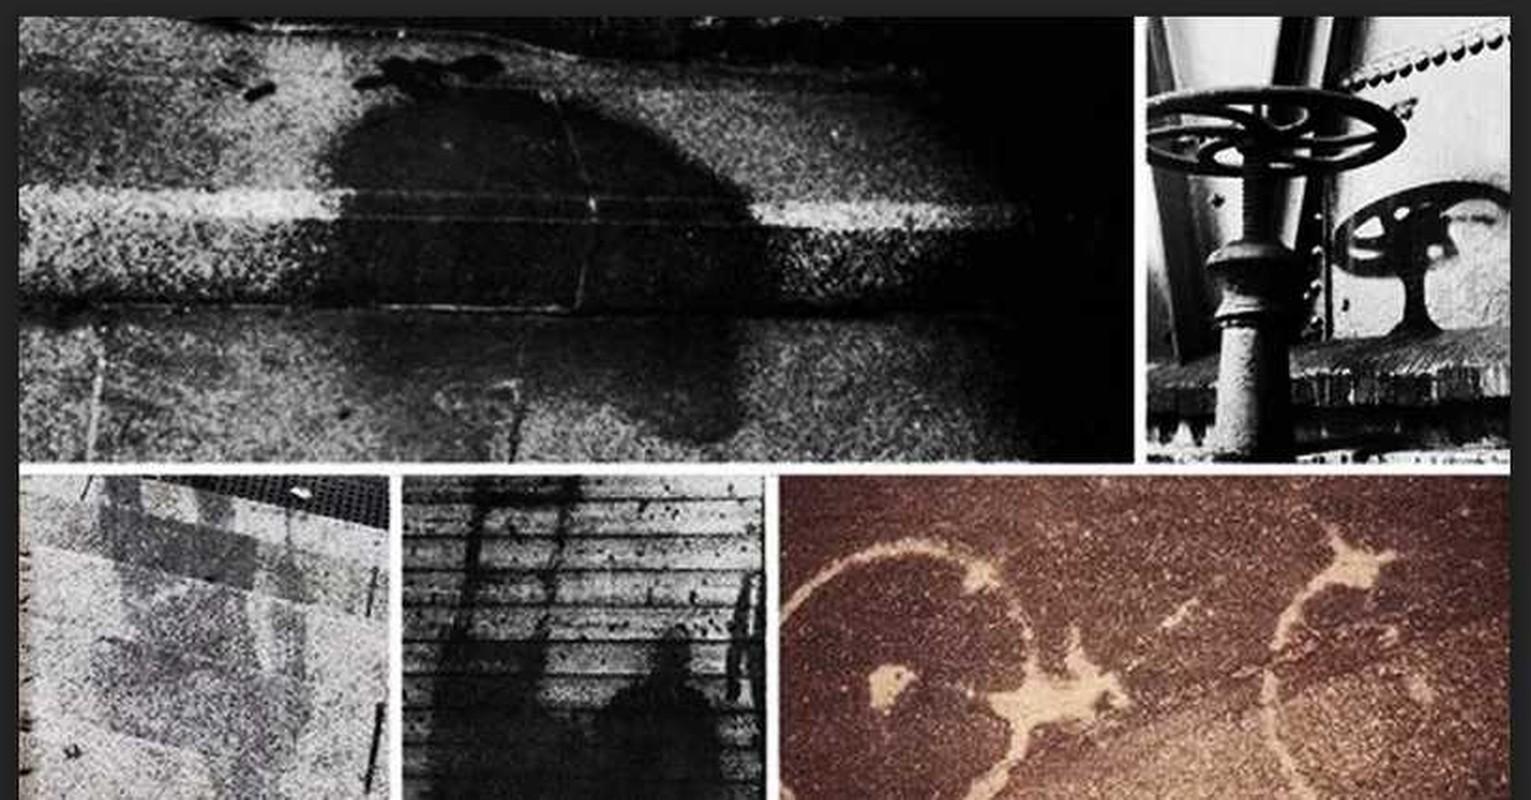 Rung ron nhung bong den sau vu no bom hat nhan o Hiroshima 1945-Hinh-6